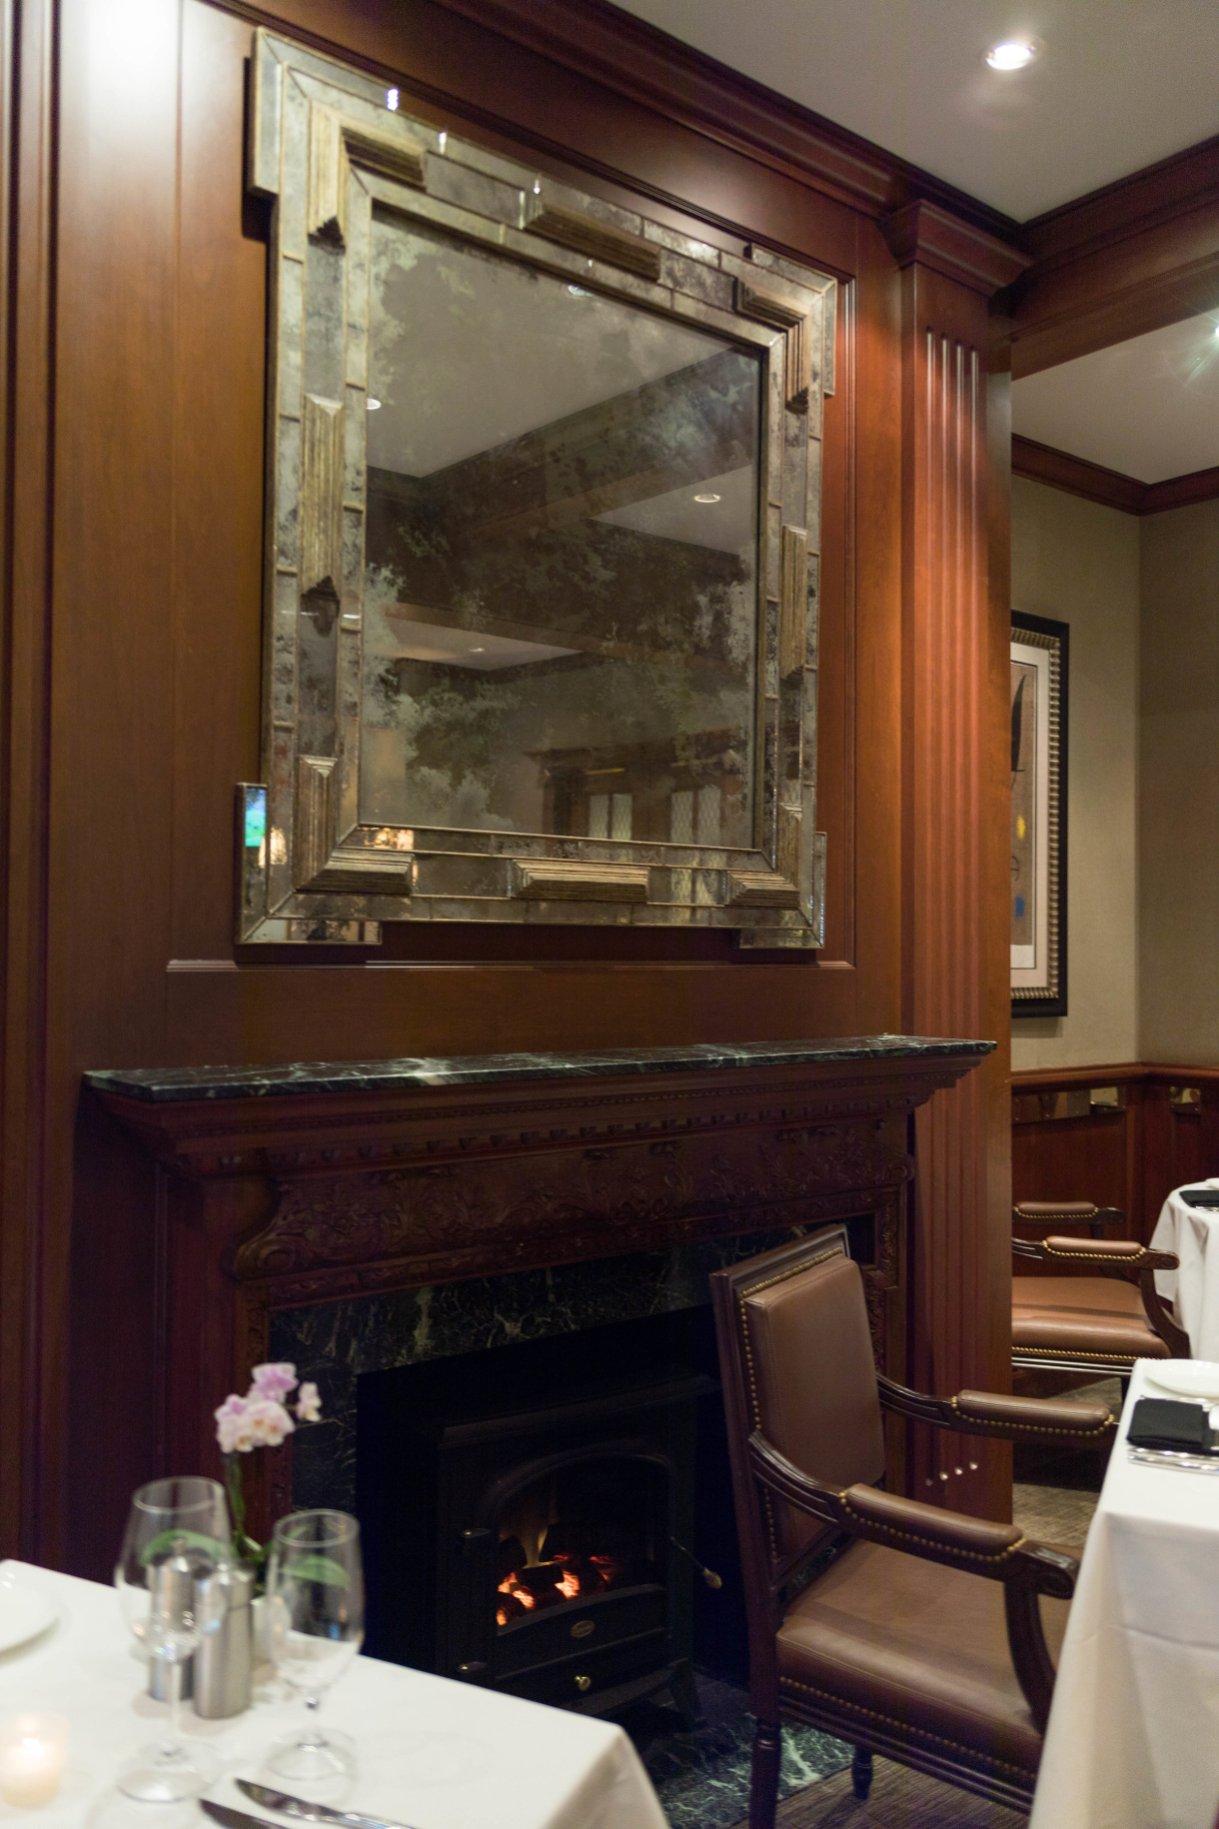 Luxury Restaurants of the World: Rugby Grille Birmingham